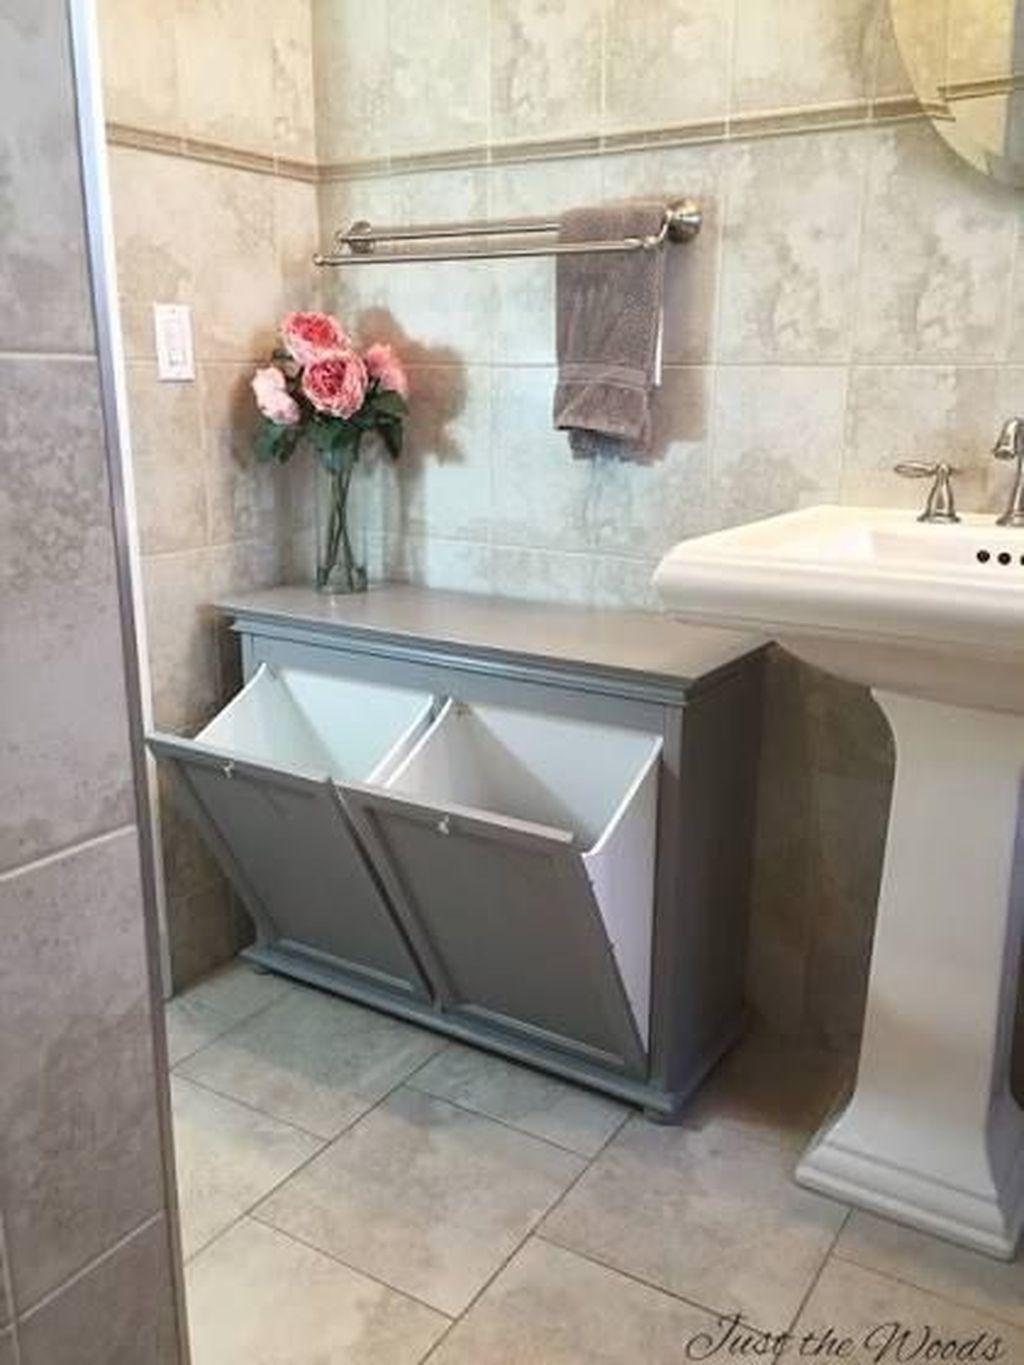 32 Master Bedroom And Bathroom Ideas 28 Bathroom Remodel Master Bathroom Interior Small Bathroom